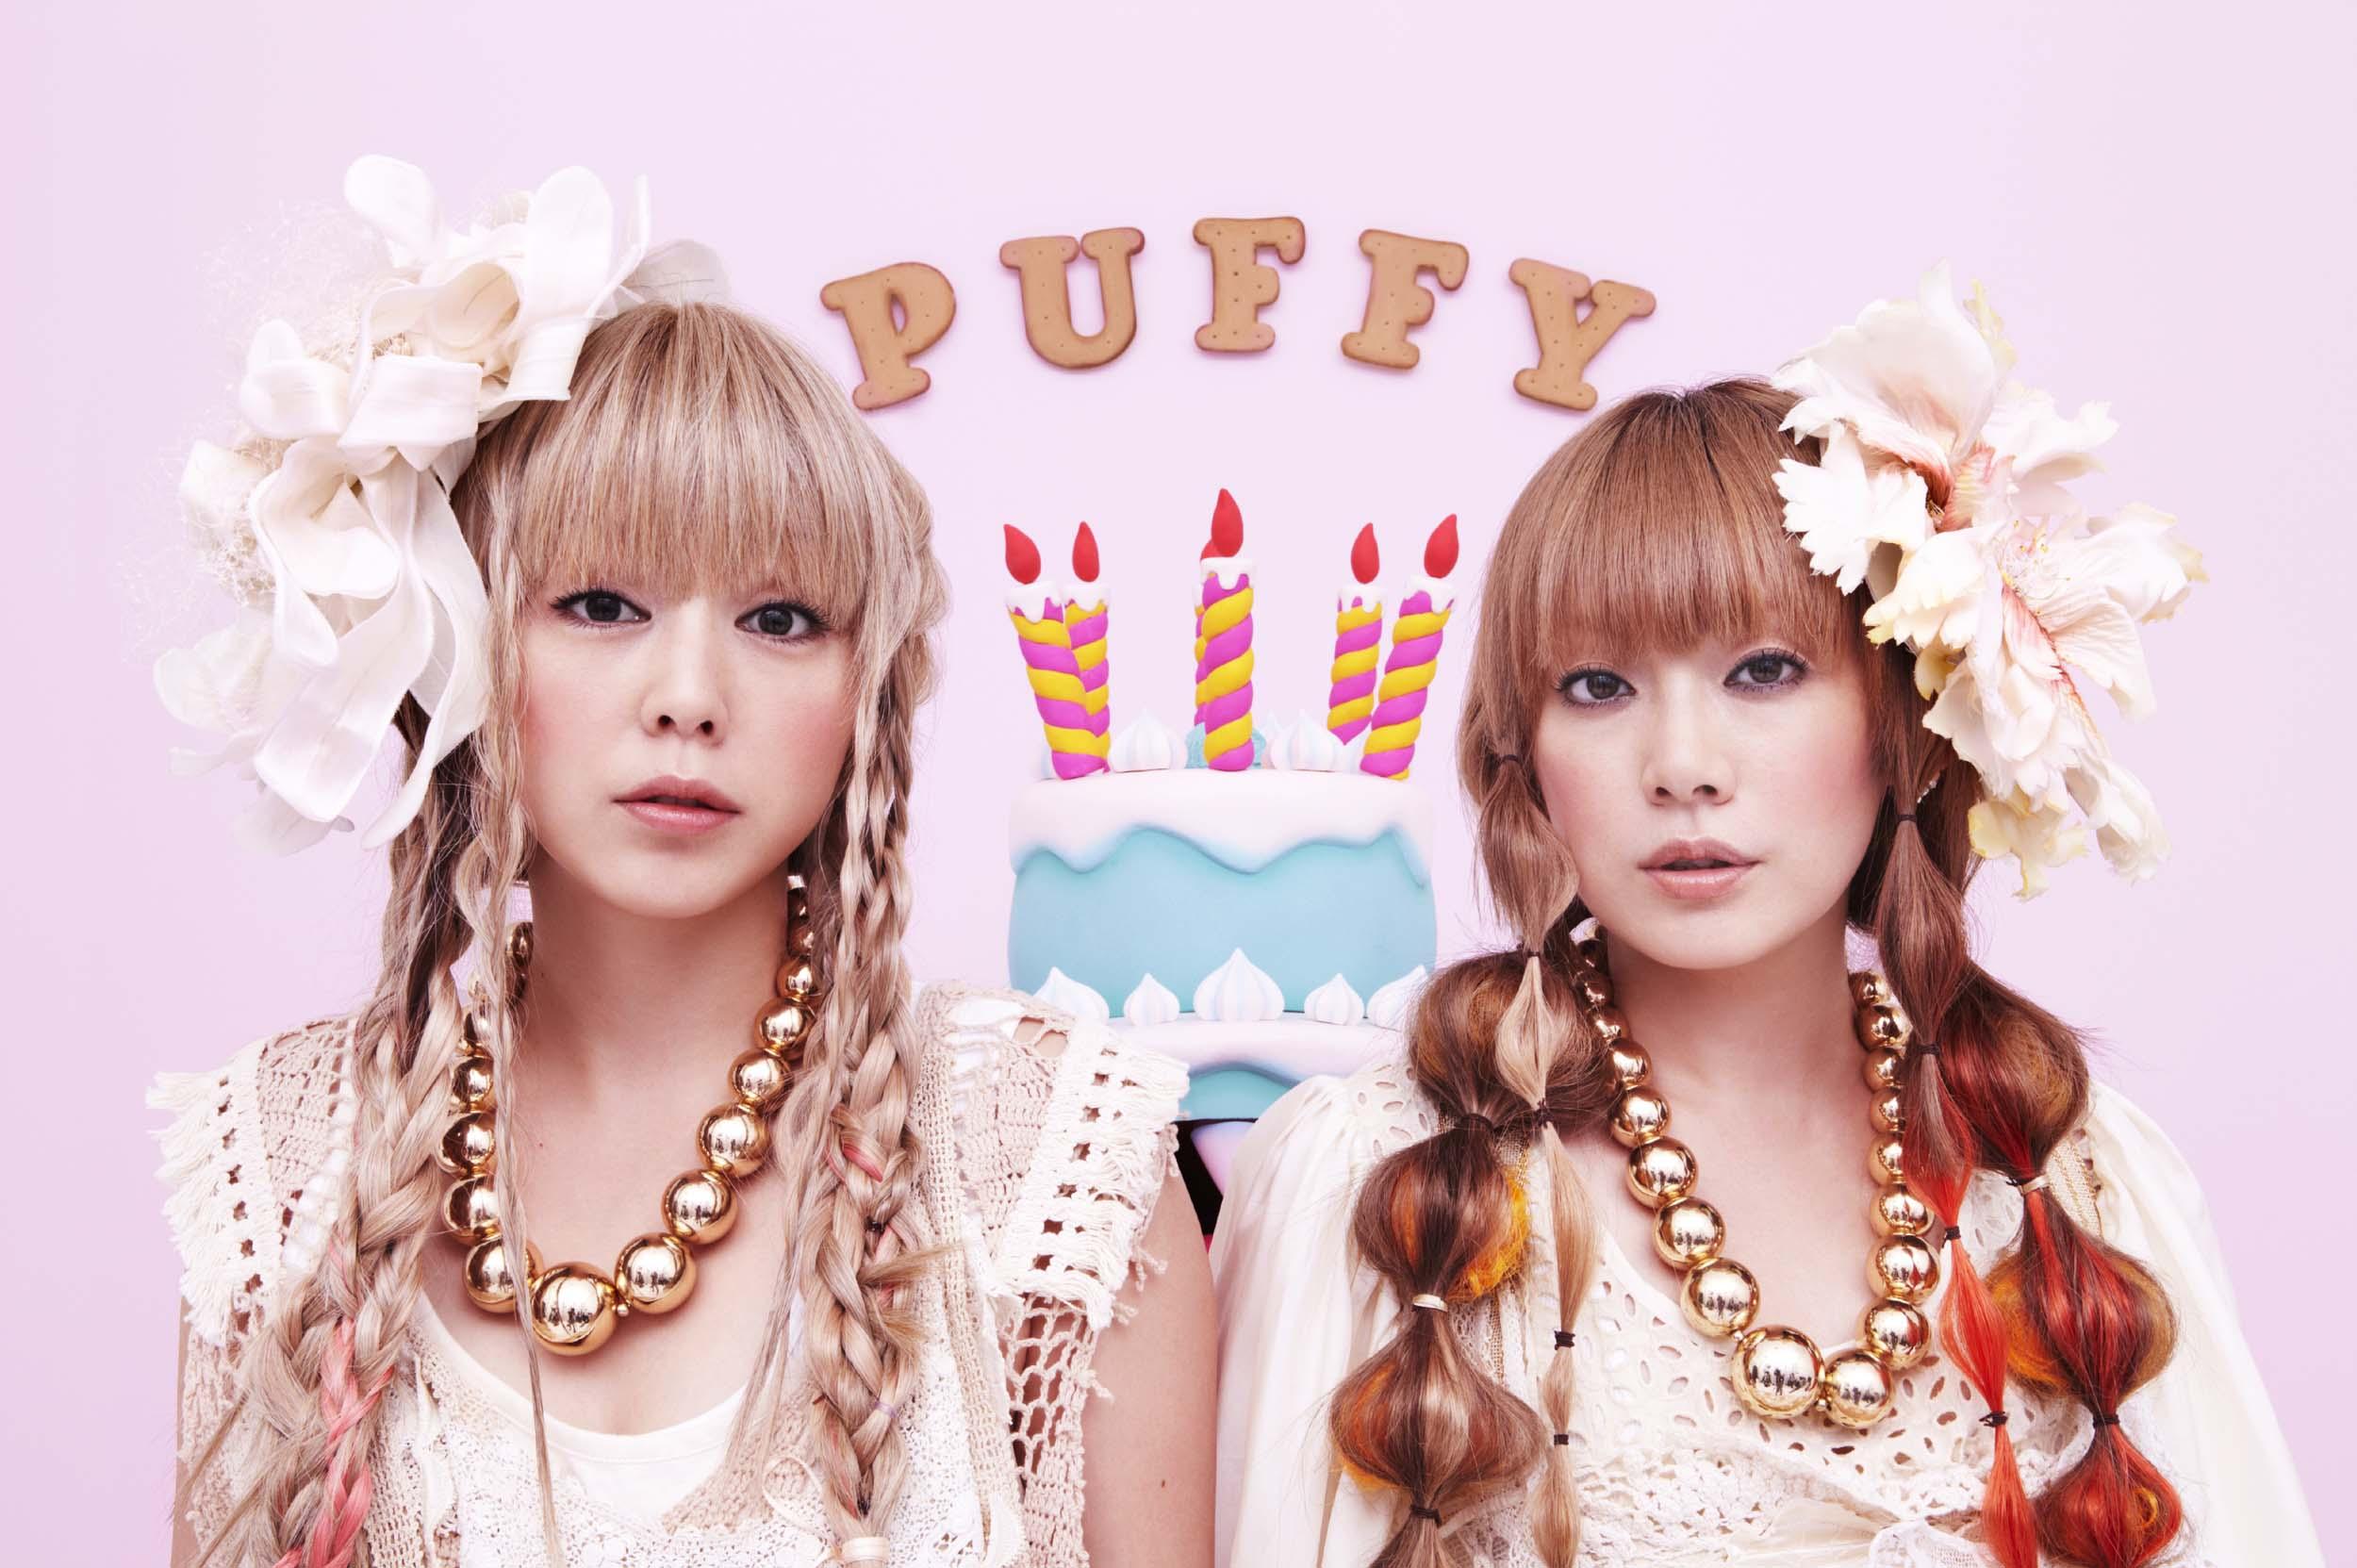 Puffy Ami Yumi Pictures   MetroLyrics